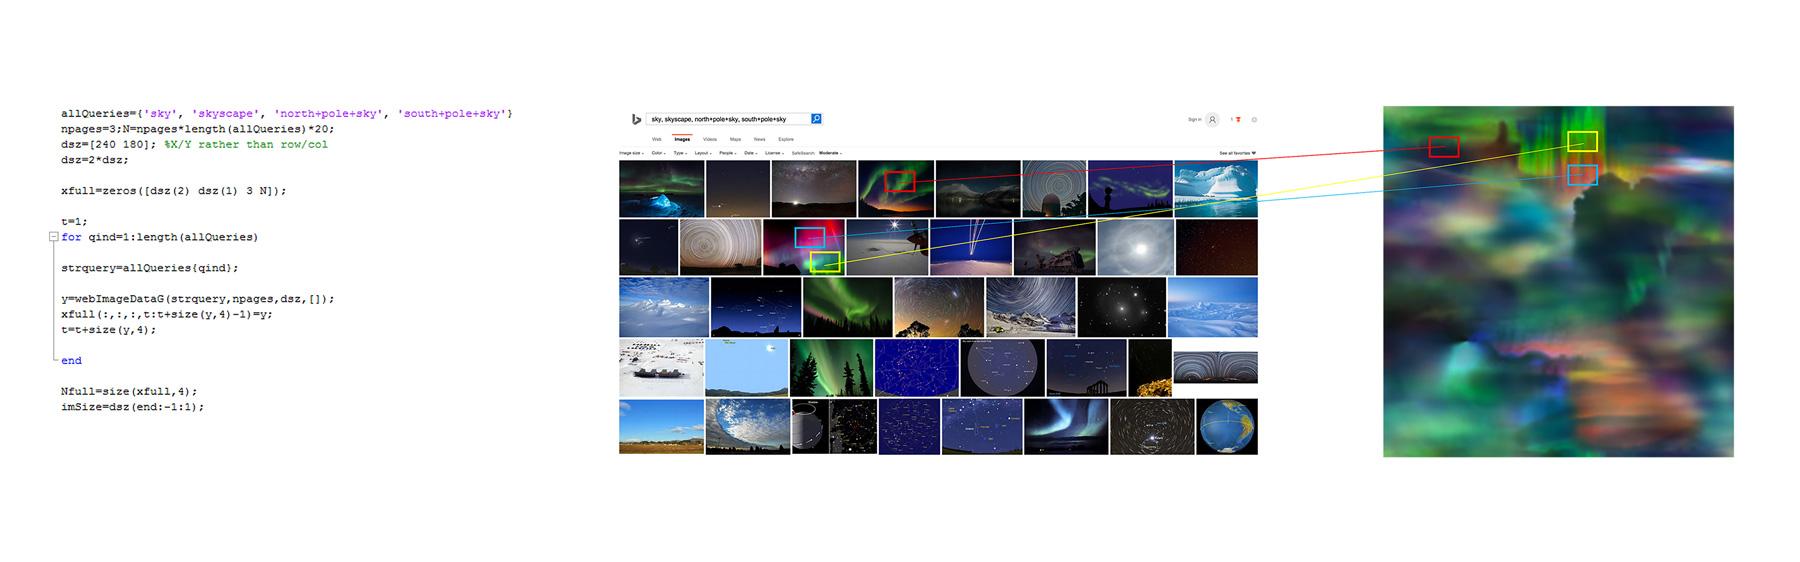 visual summarization (epitome) of the polar sky